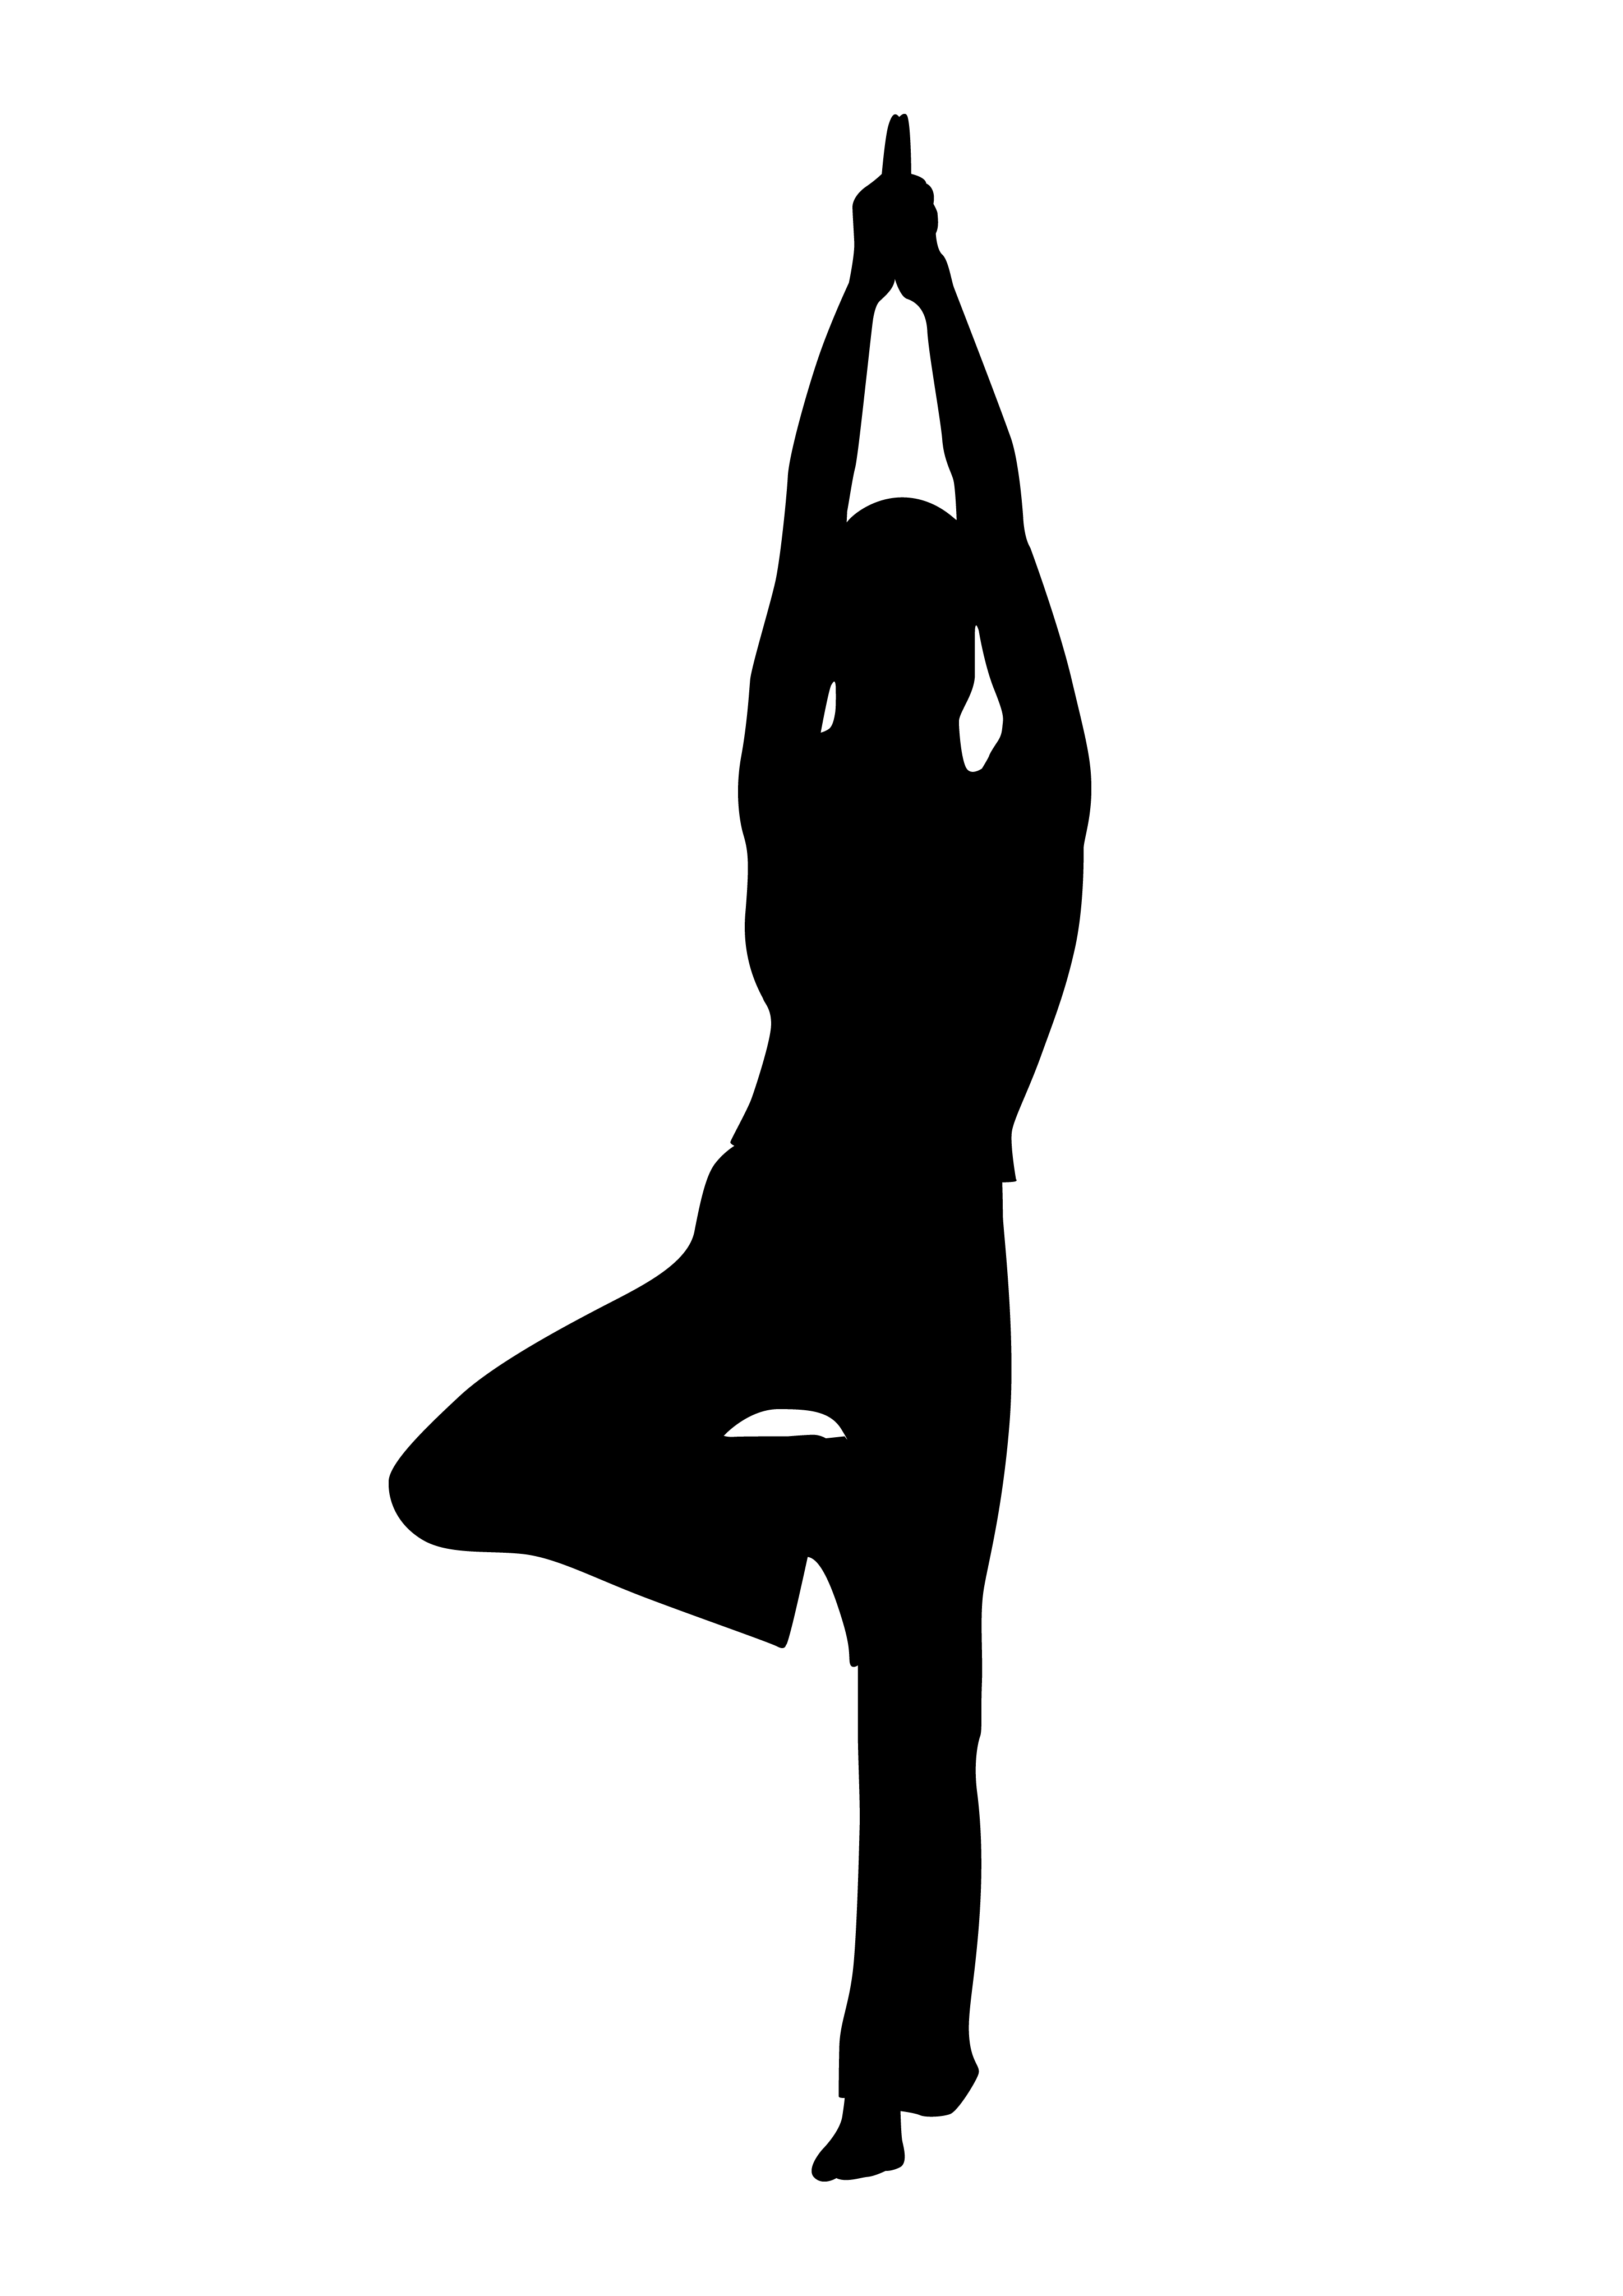 Yoga Poses Stylized clip art ... 9075f45348b4f792673f741ad1d3e3 .